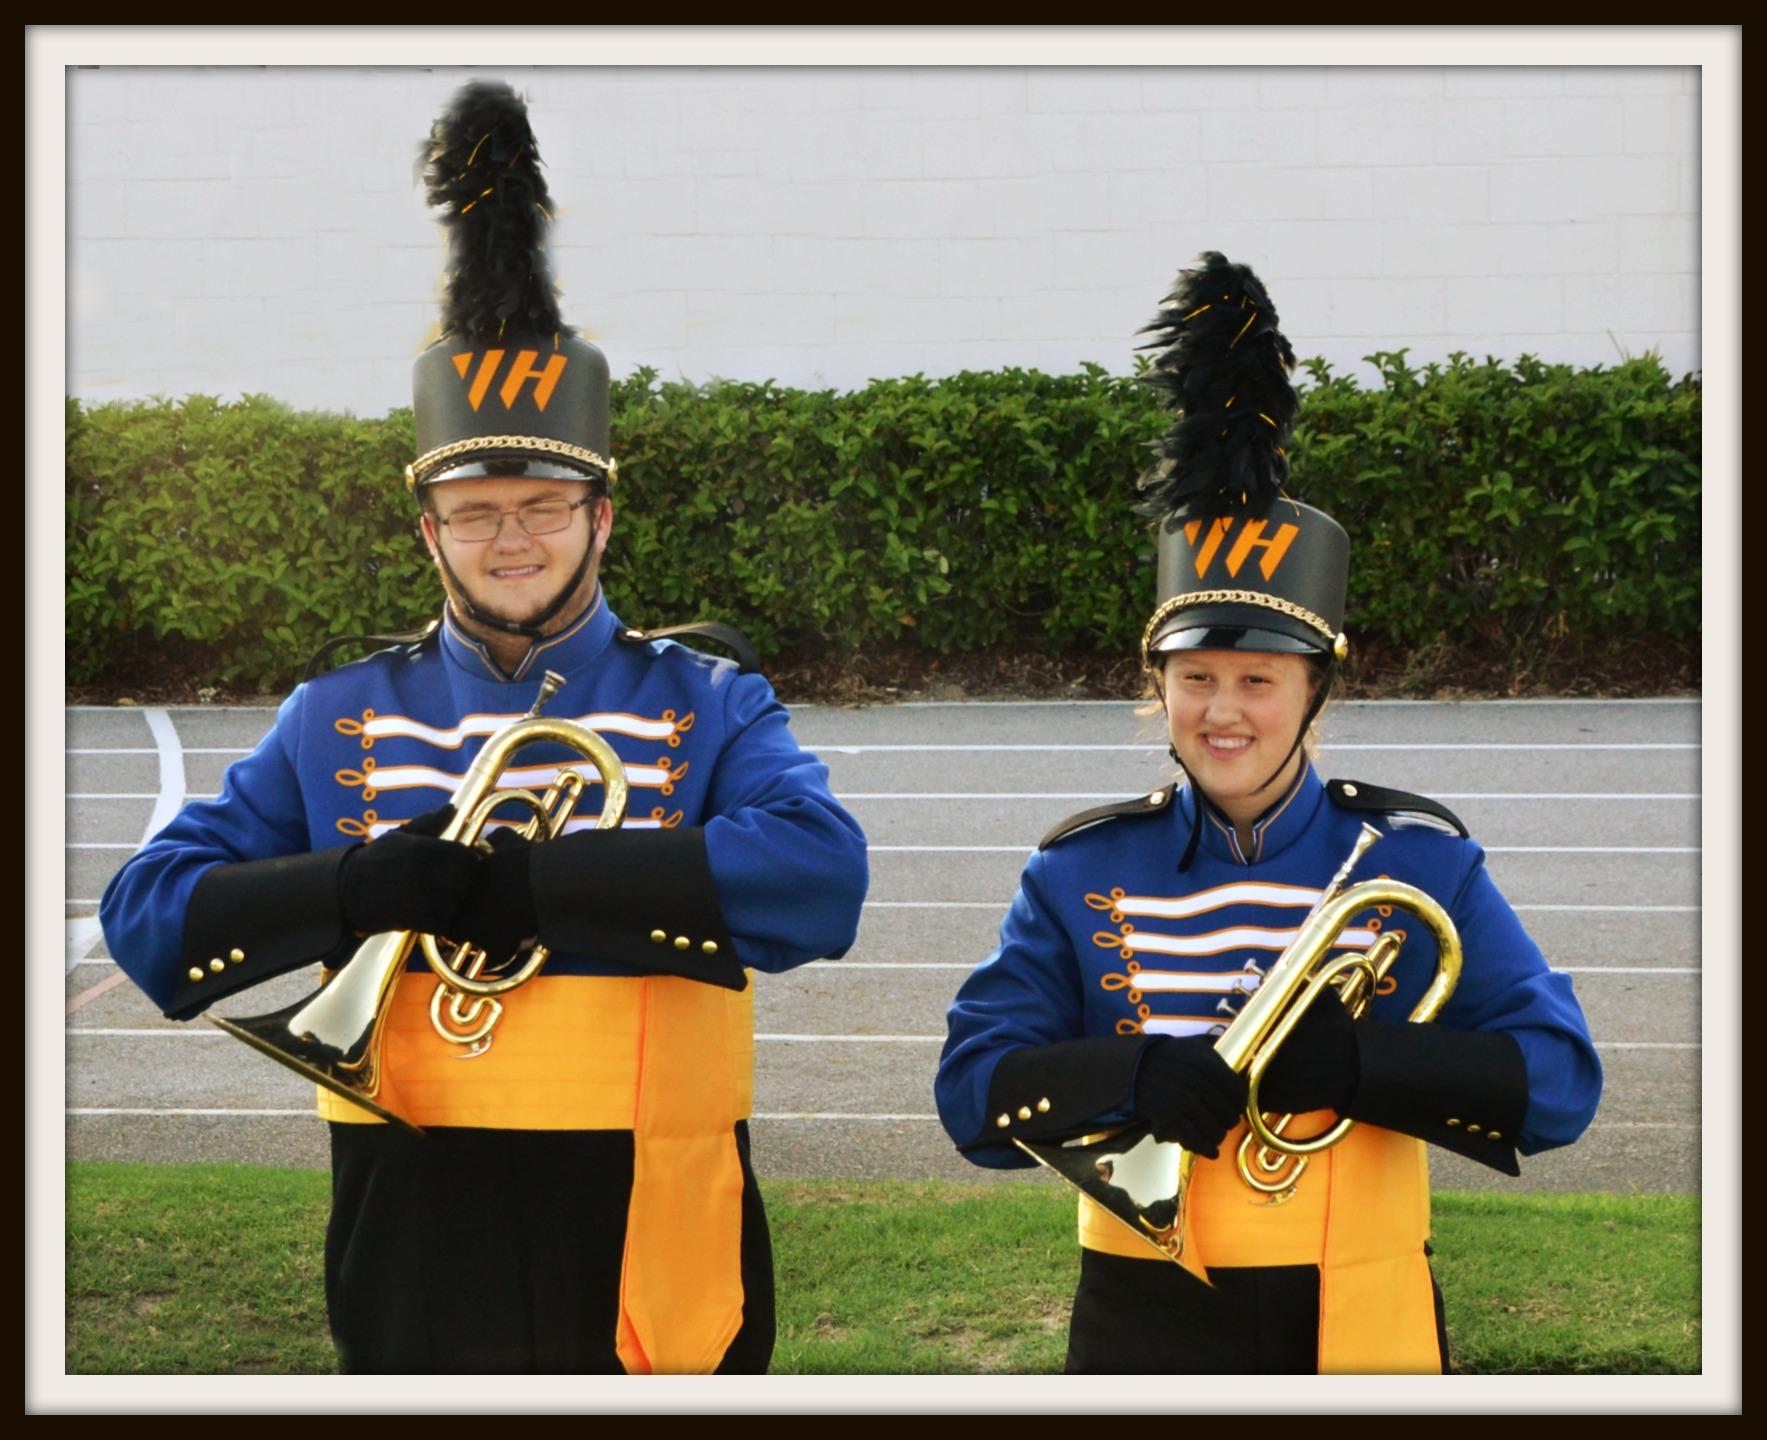 Band Photos 16-17 013.jpg